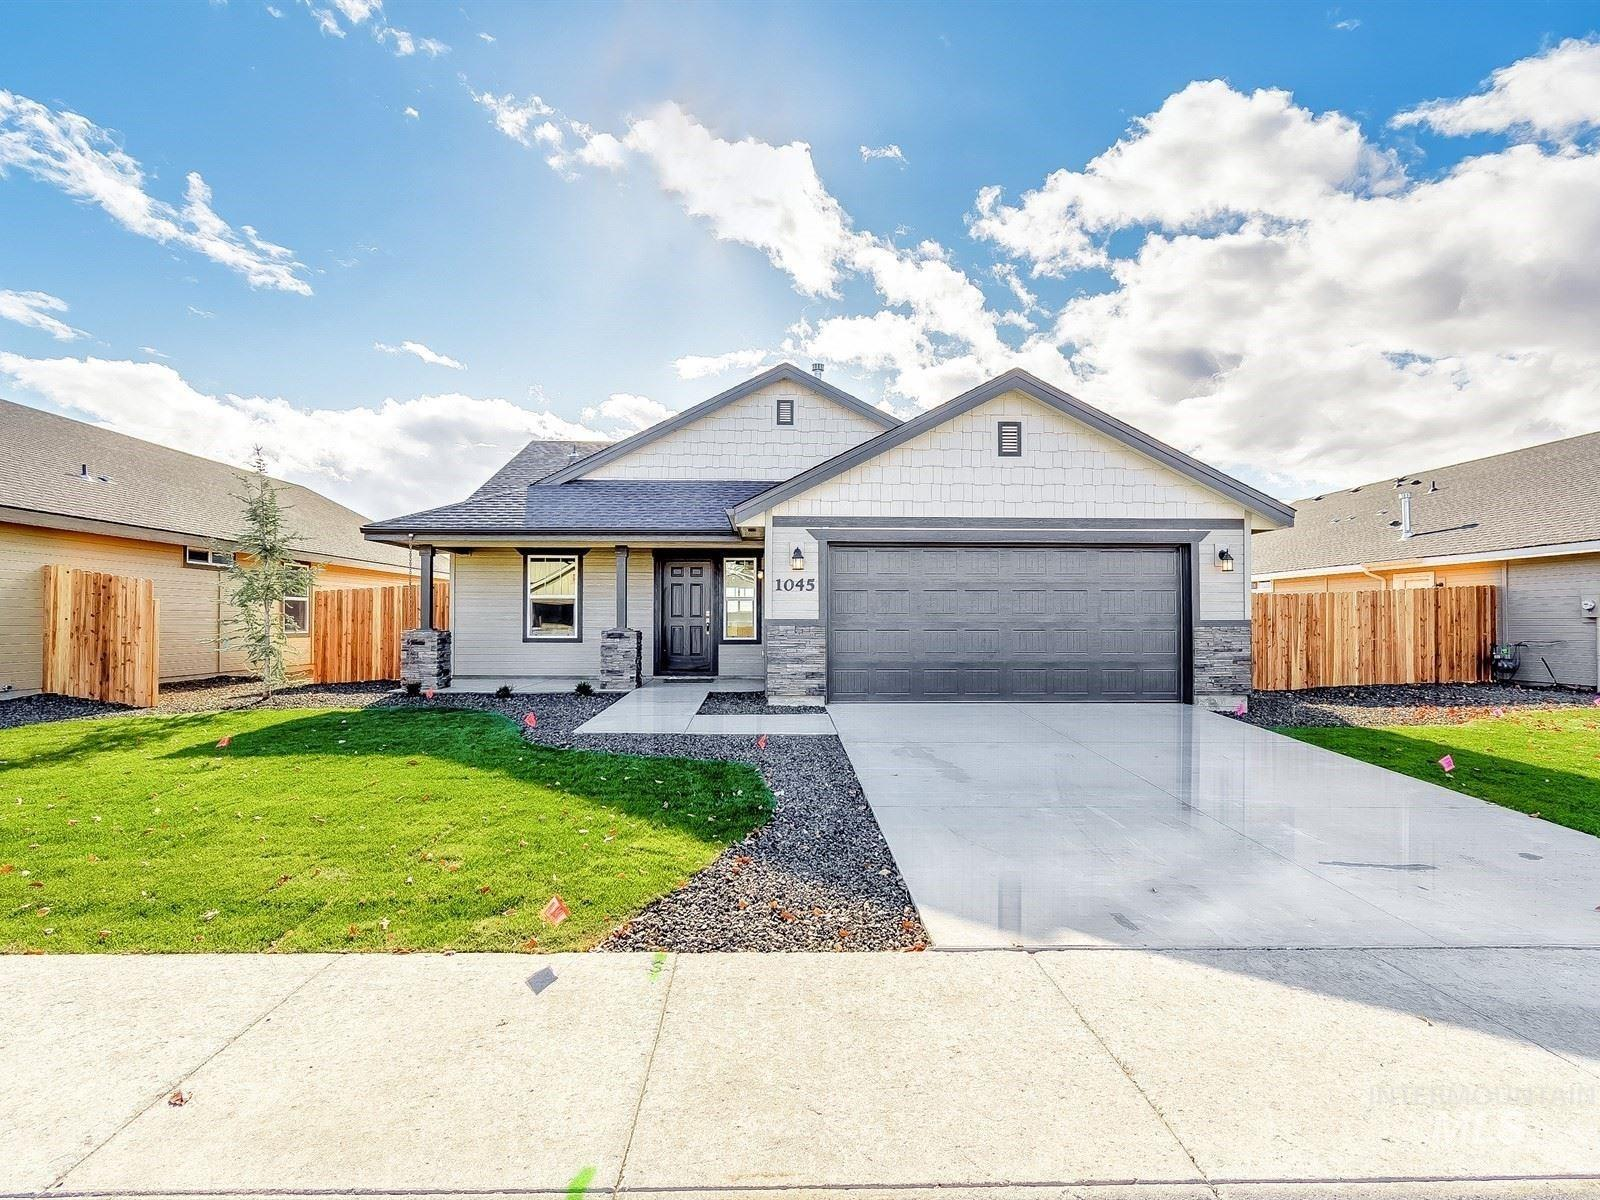 7637 E Iroquois St. Property Photo - Nampa, ID real estate listing